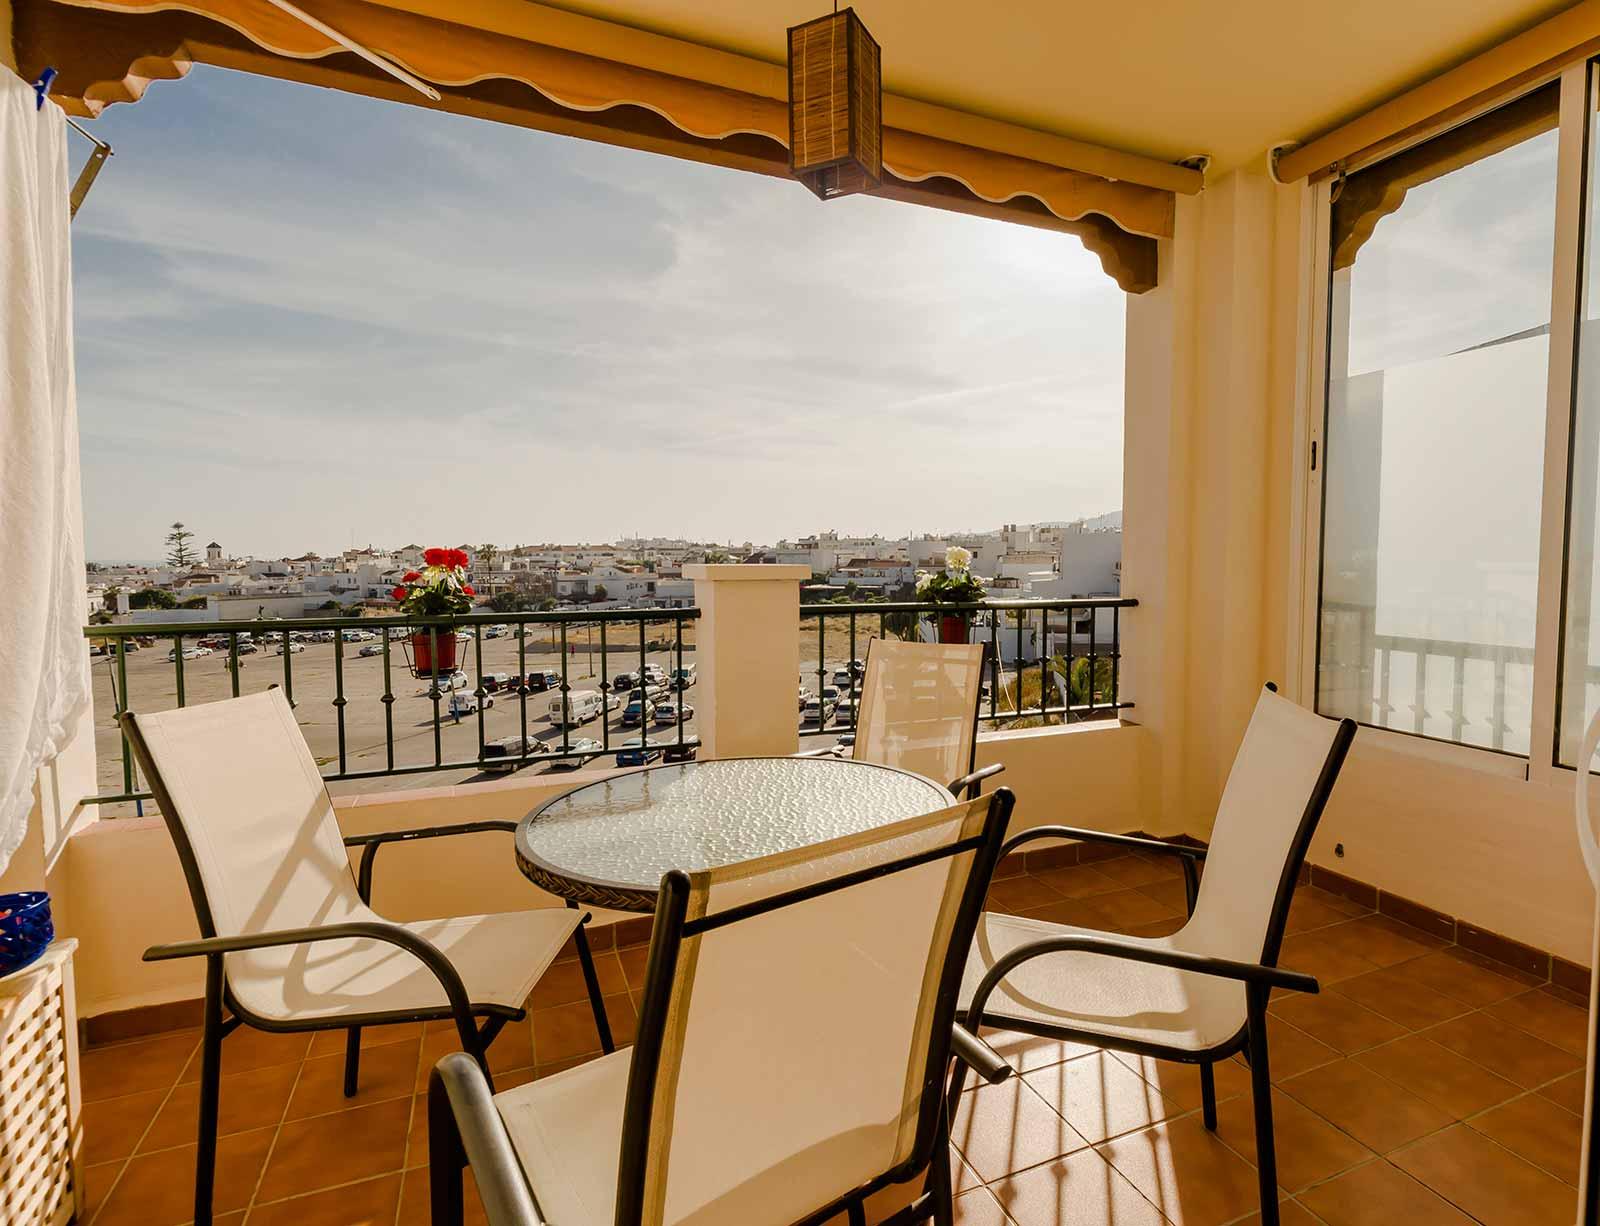 Carabeo2000-3_1 Terrace